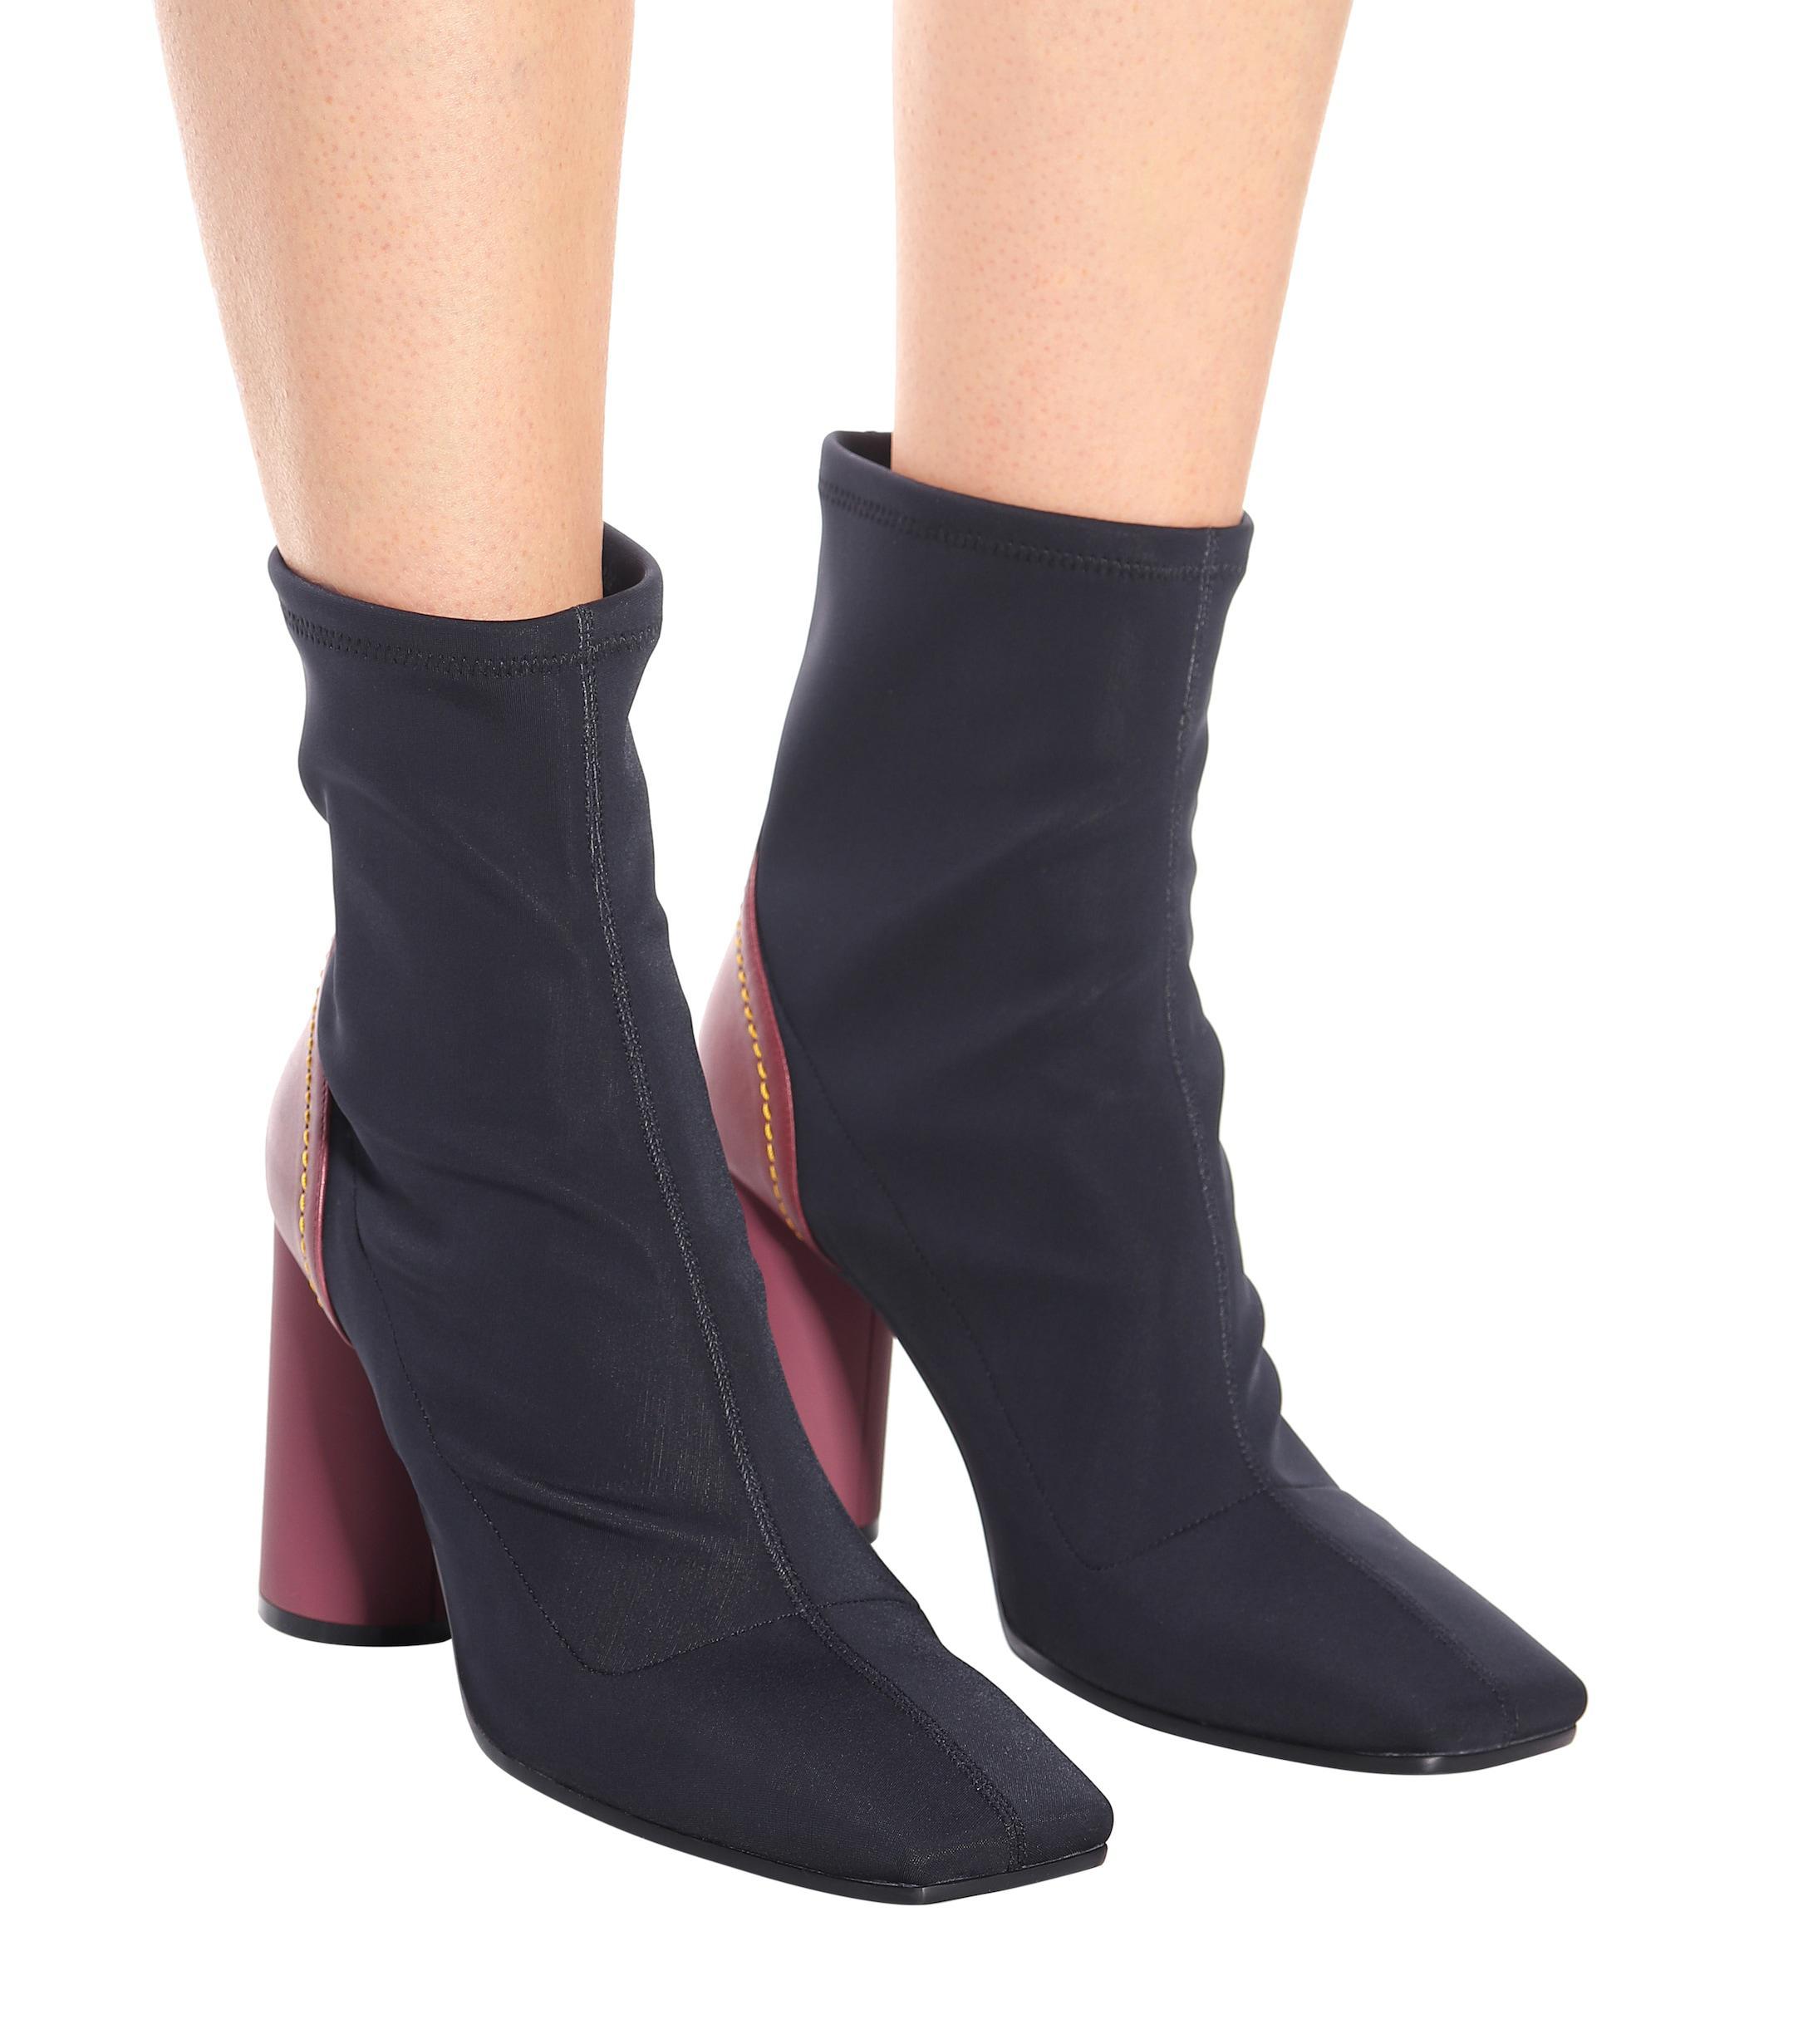 Ellery Neoprene Ankle Boots in Black